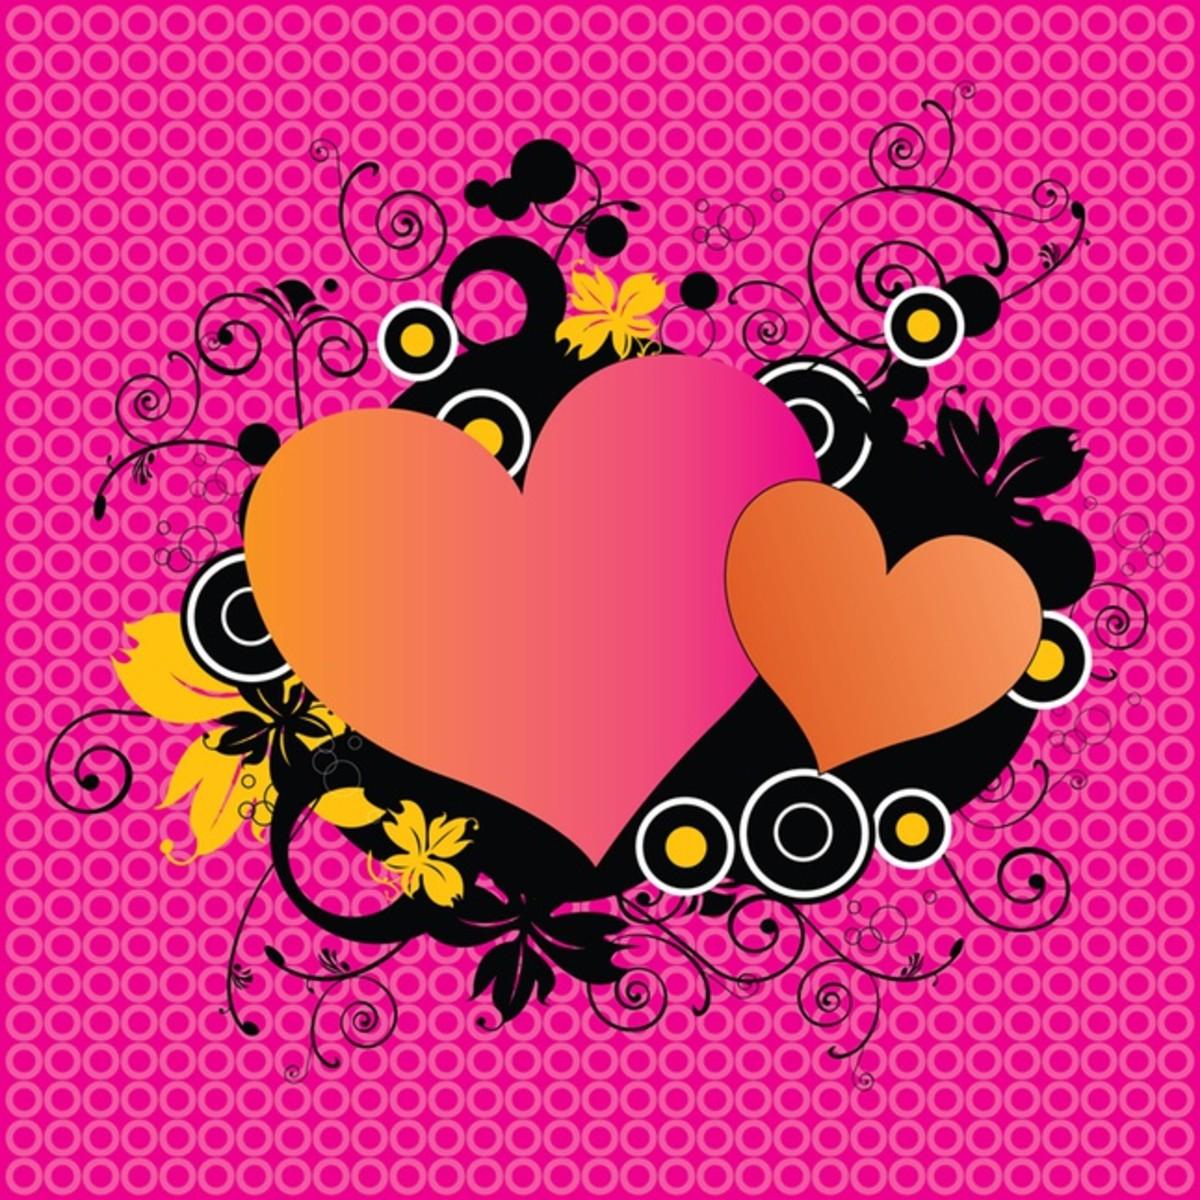 Hearts Graphic